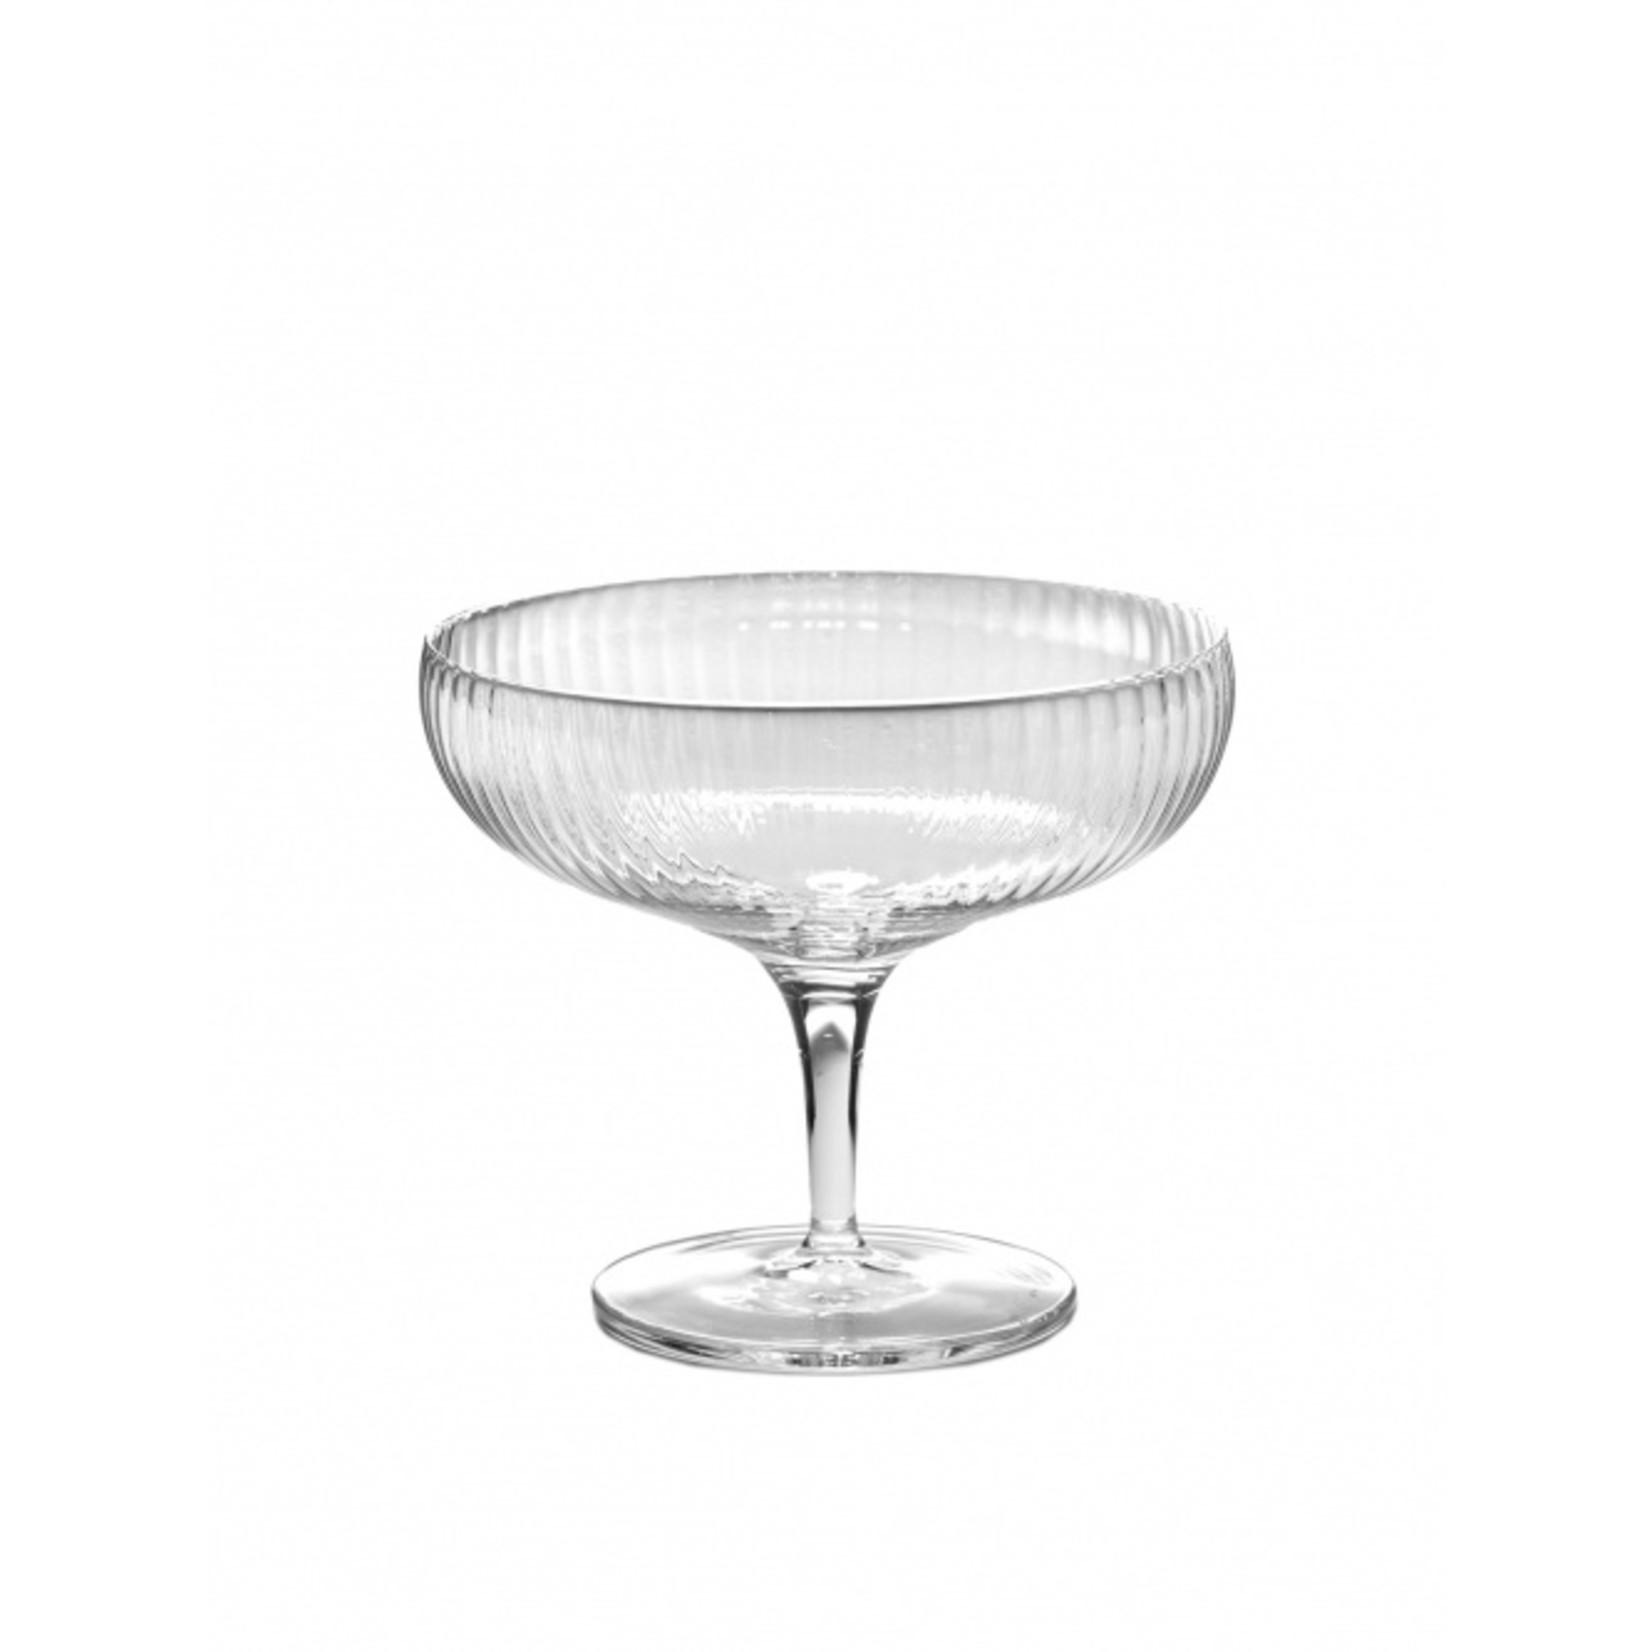 Sergio Herman Inku Champagne coupe Inku